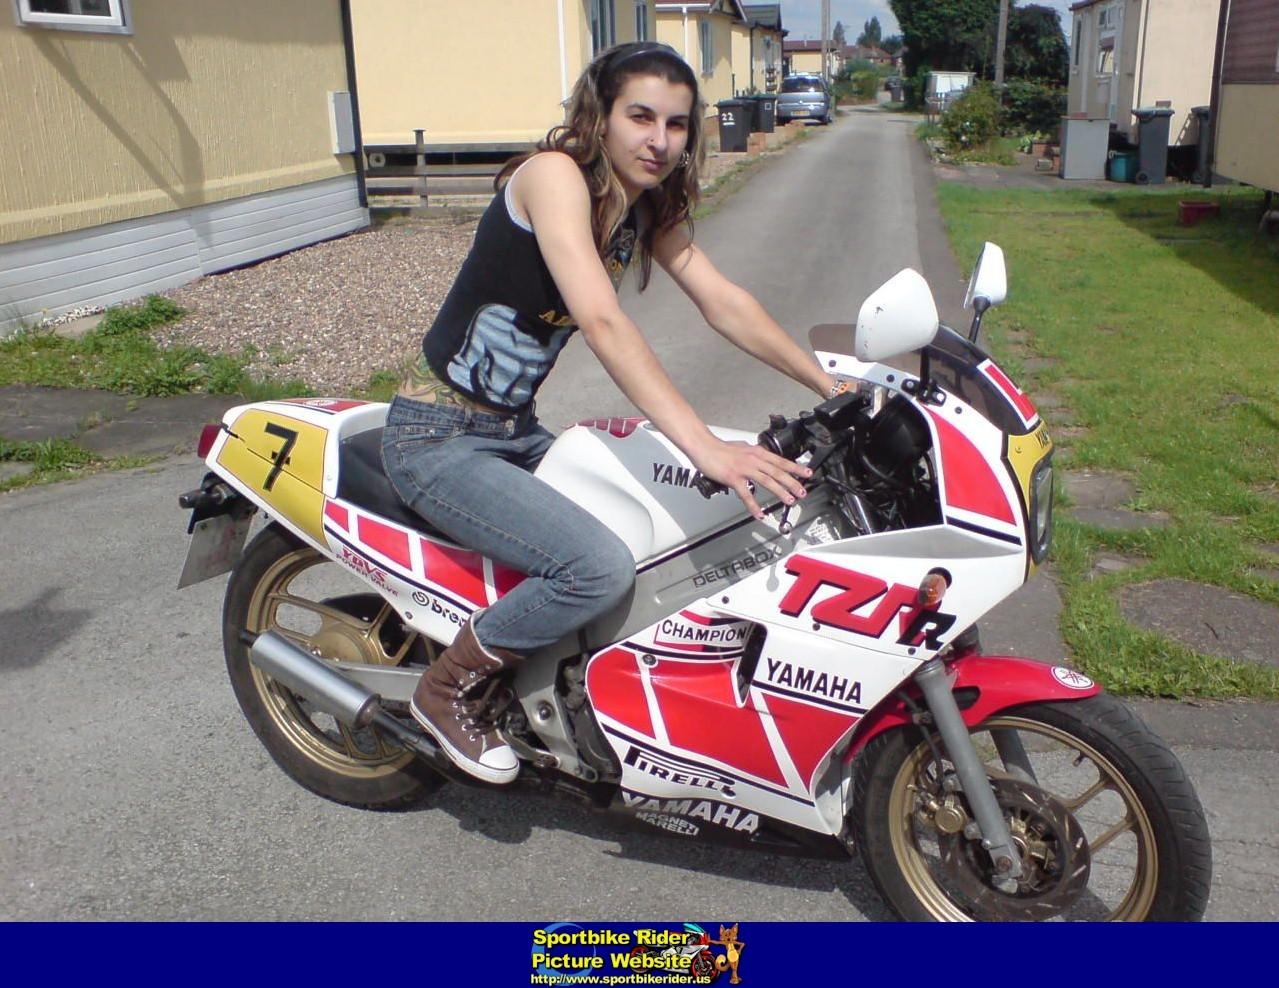 Yamaha TZR125